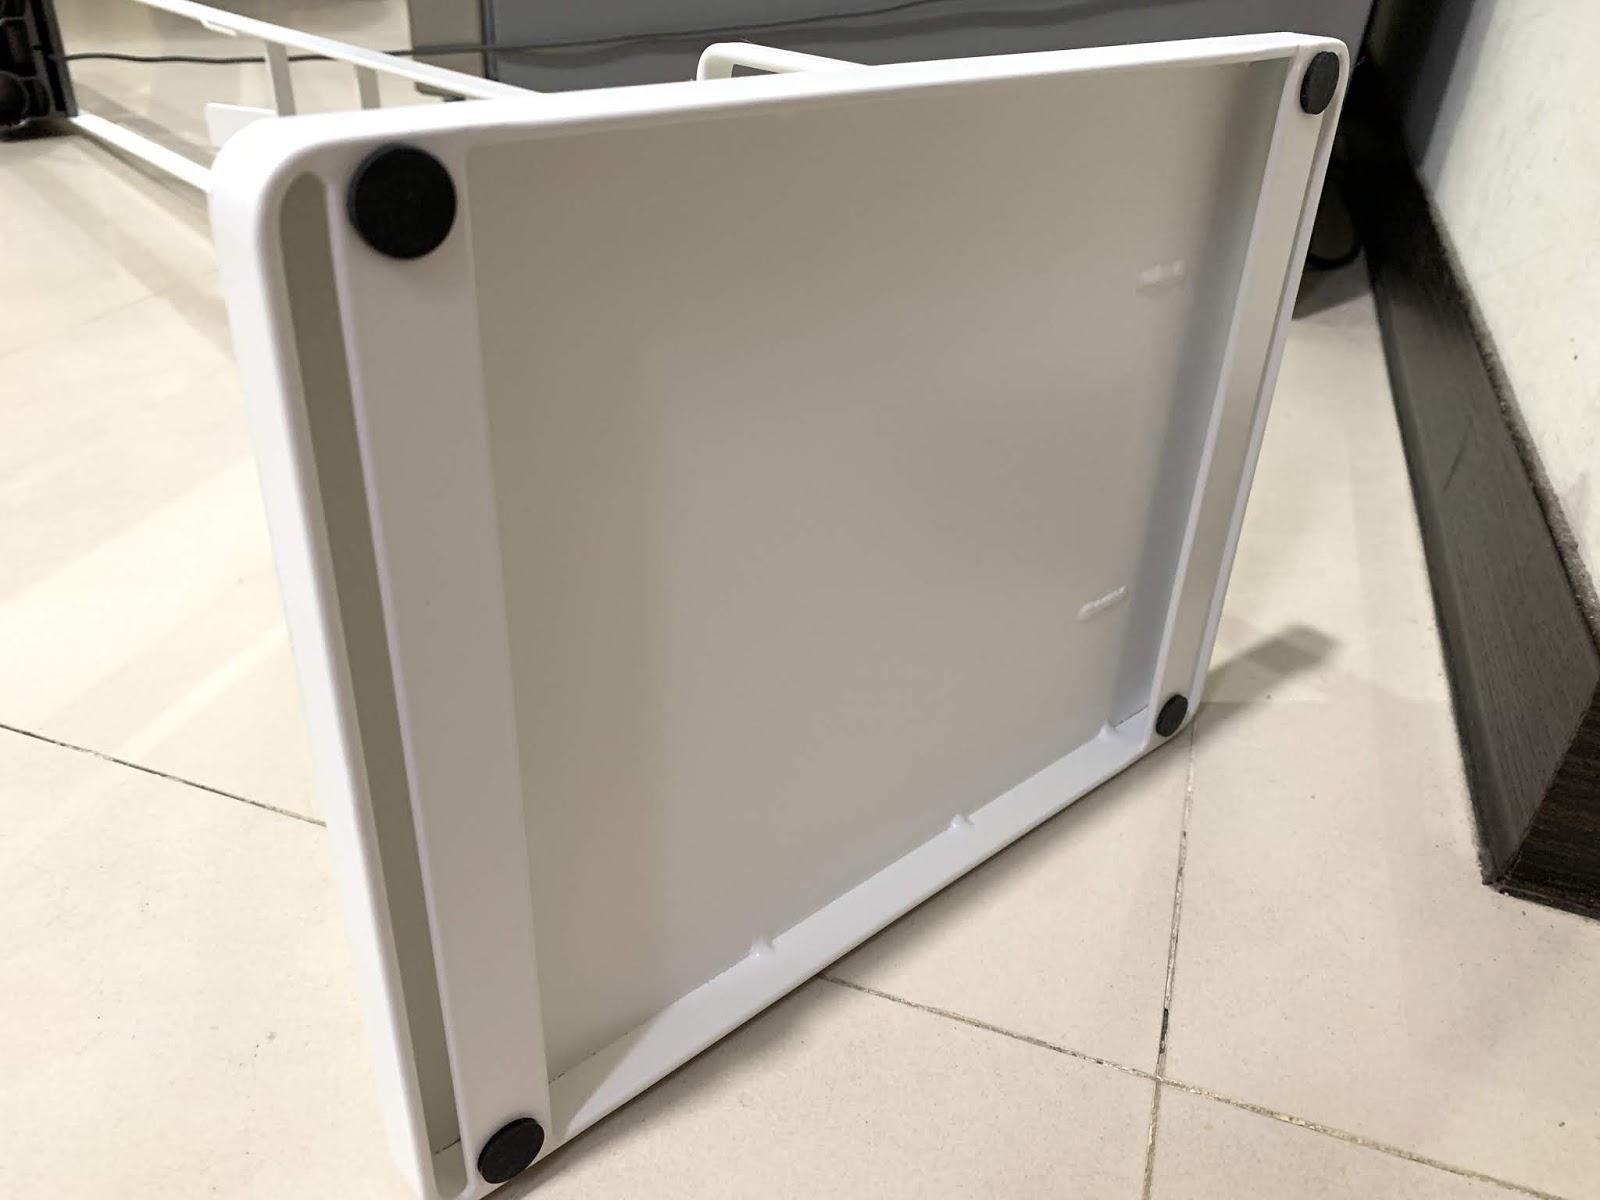 Plate多功能吸塵器收納架 山崎收納 YAMAZAKI 客廳收納 止滑墊 吸塵器收納 吸塵器架